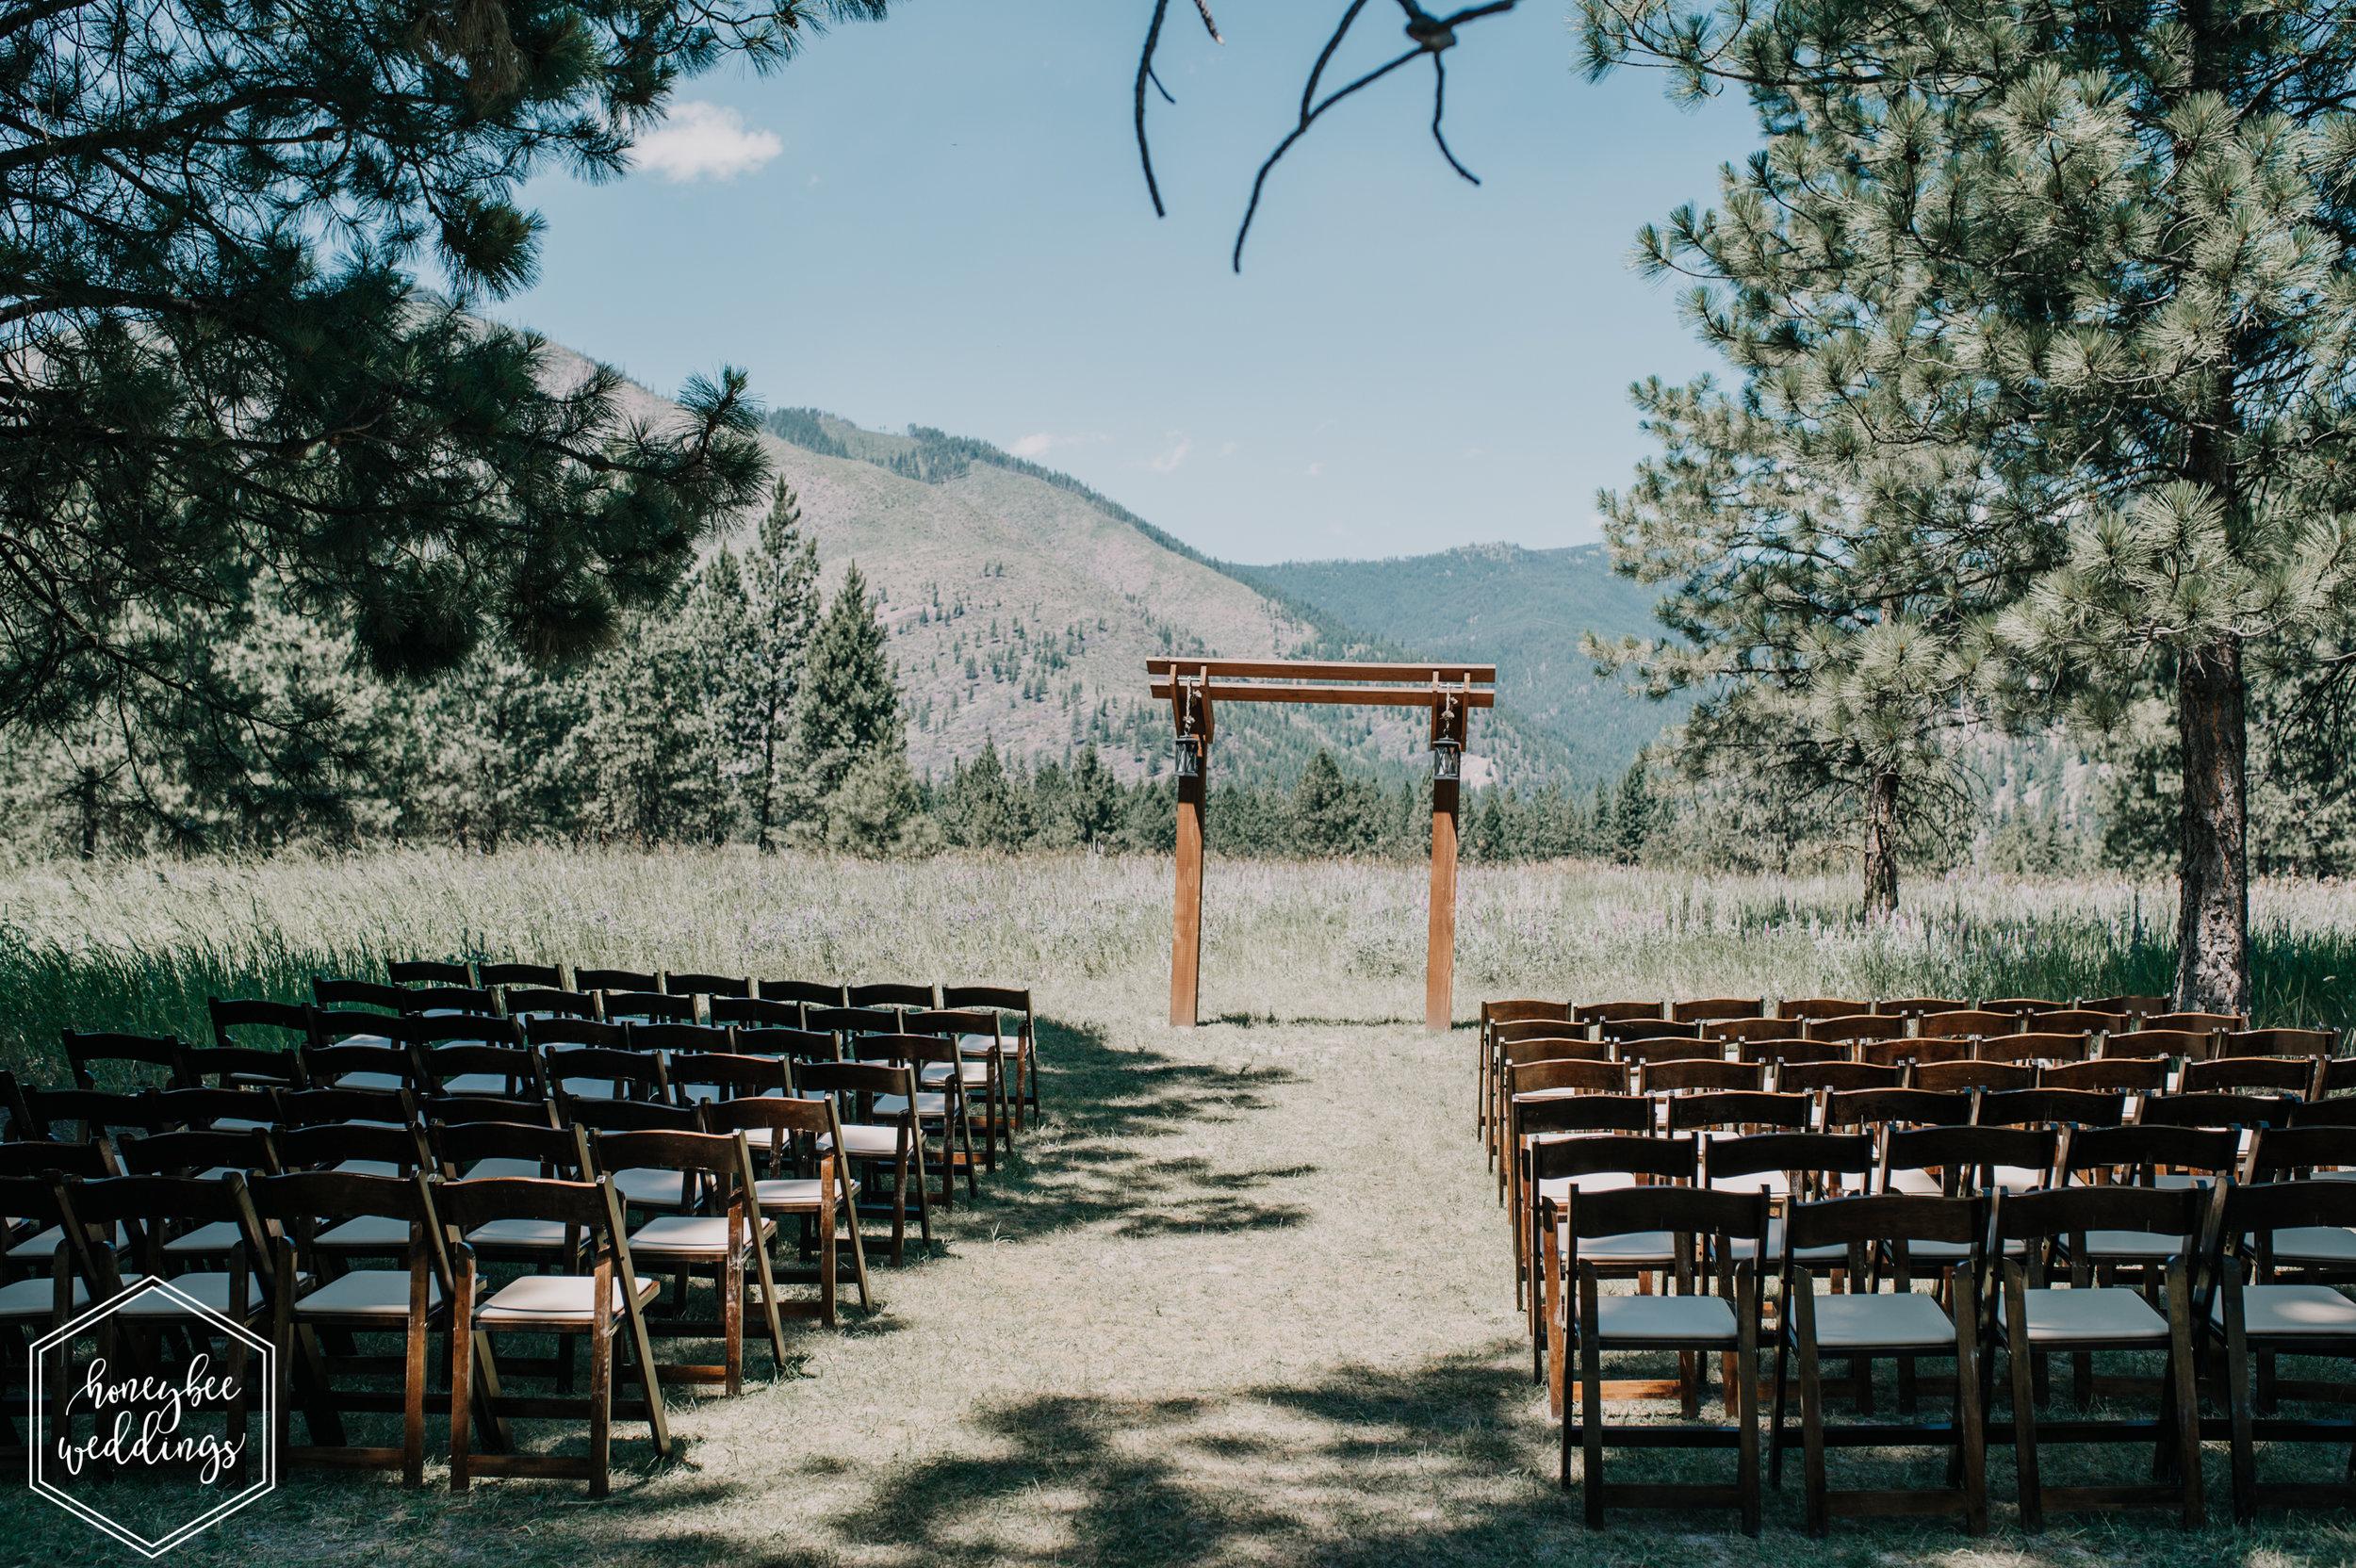 6 White Raven Wedding_Montana Wedding Photographer_Honeybee Weddings_ Meghan Maloney + Arza Hammond 2018-9880-2.jpg